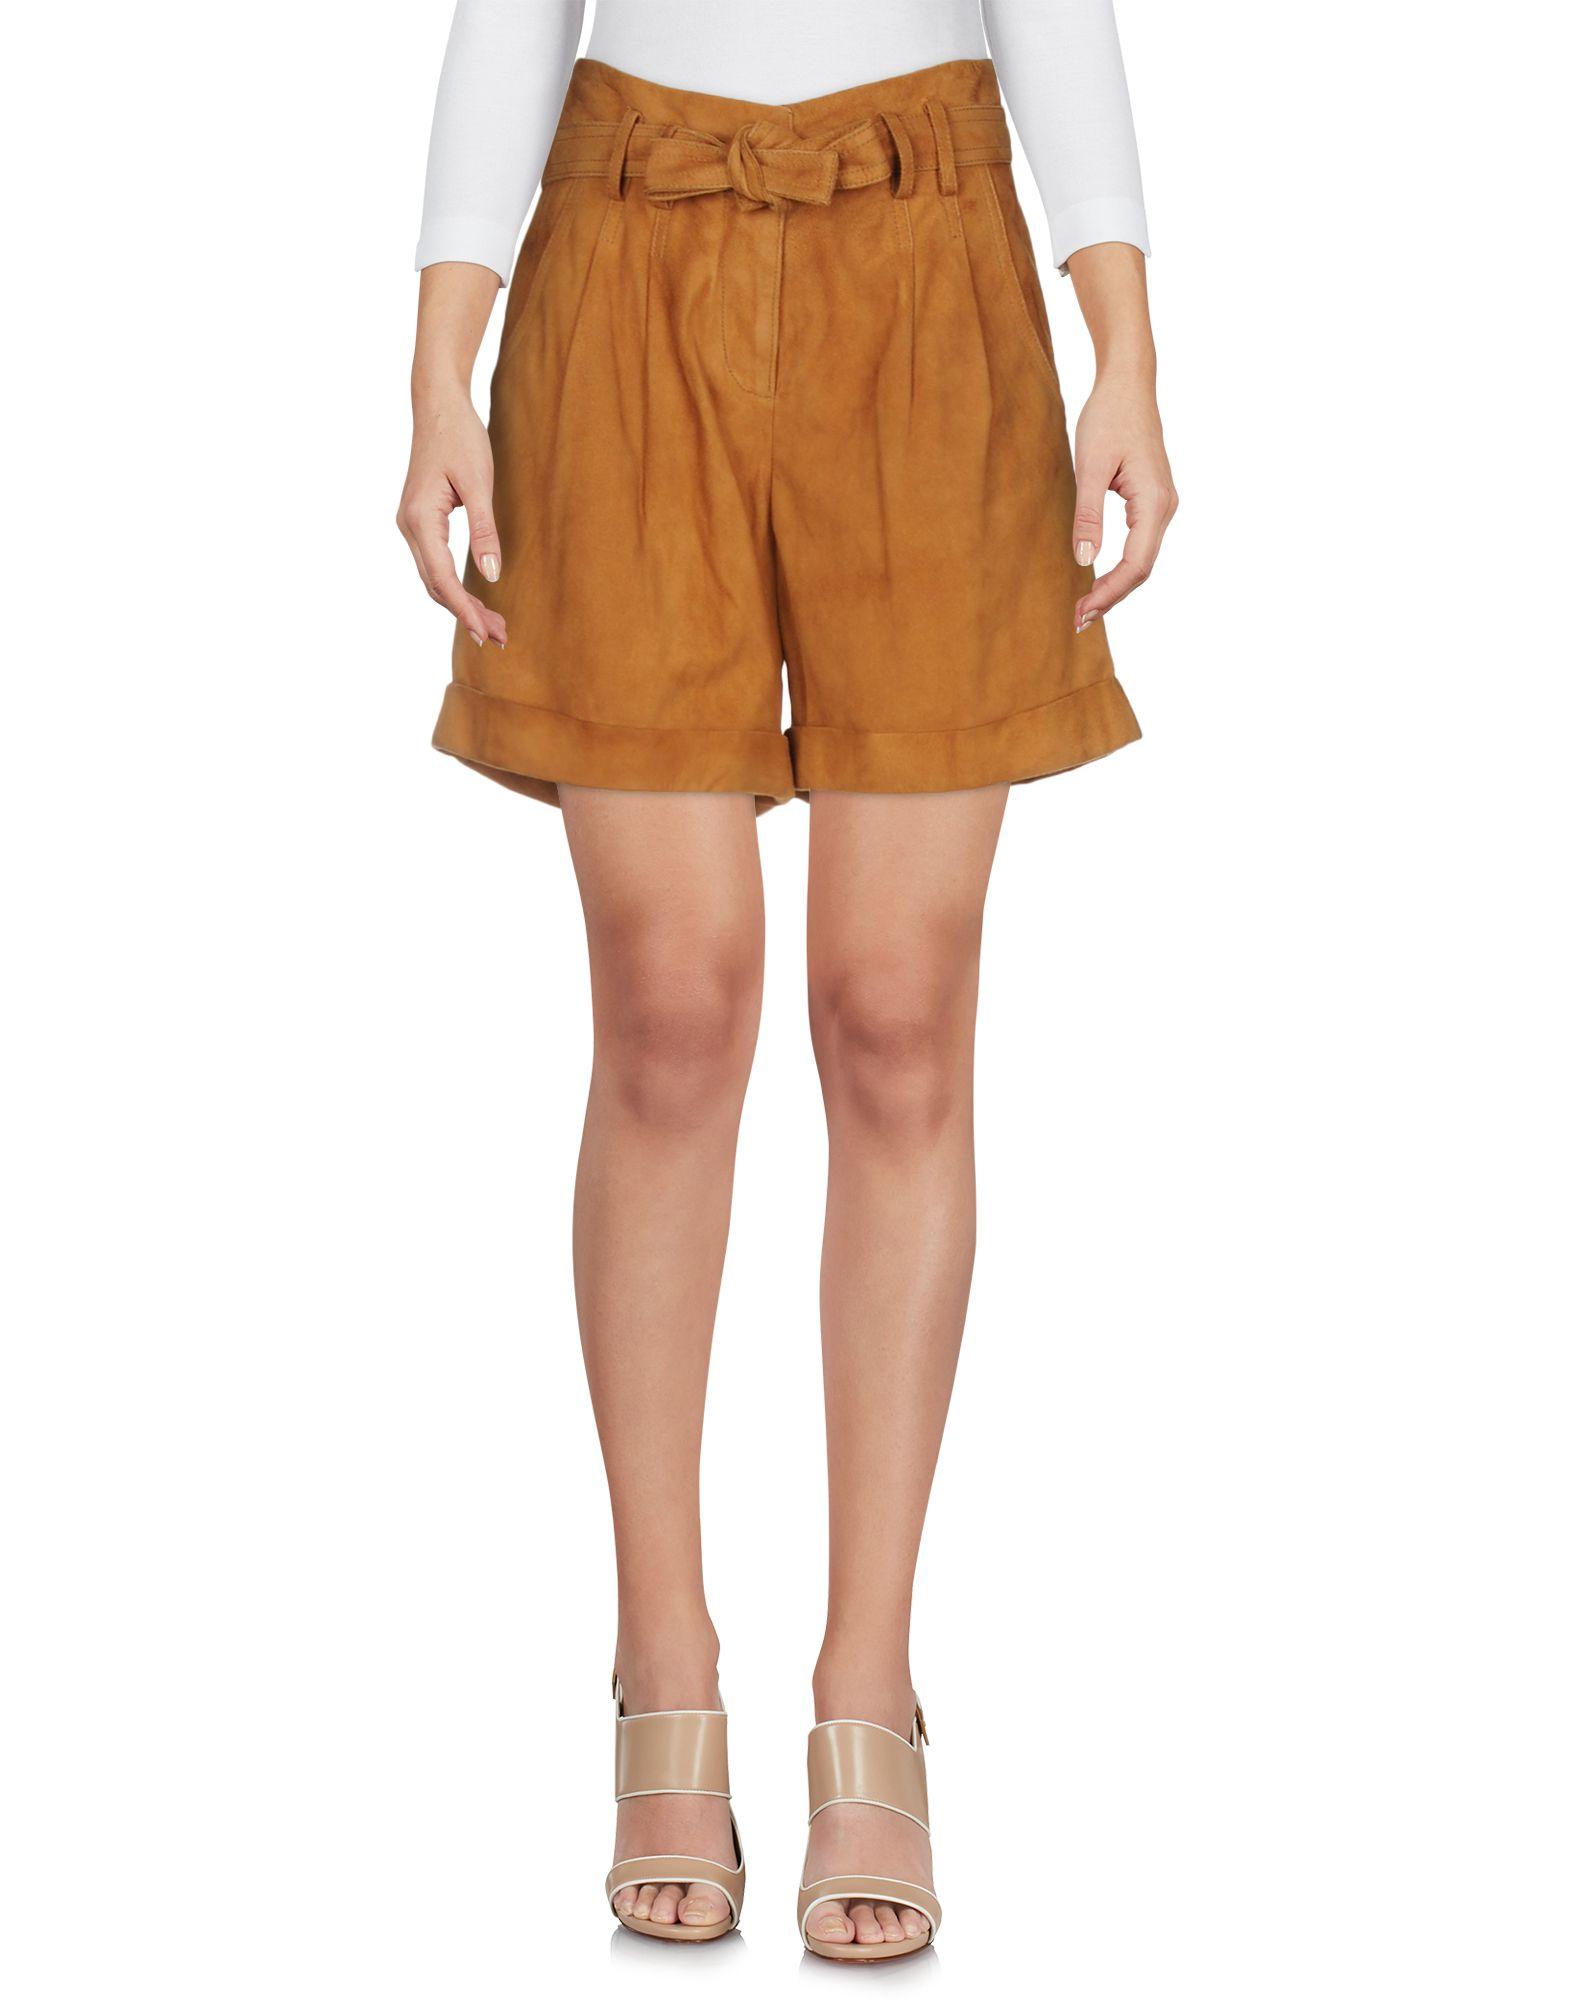 Pantalone Pelle Henry Cotton's Donna - Acquista online su g2OzNPP